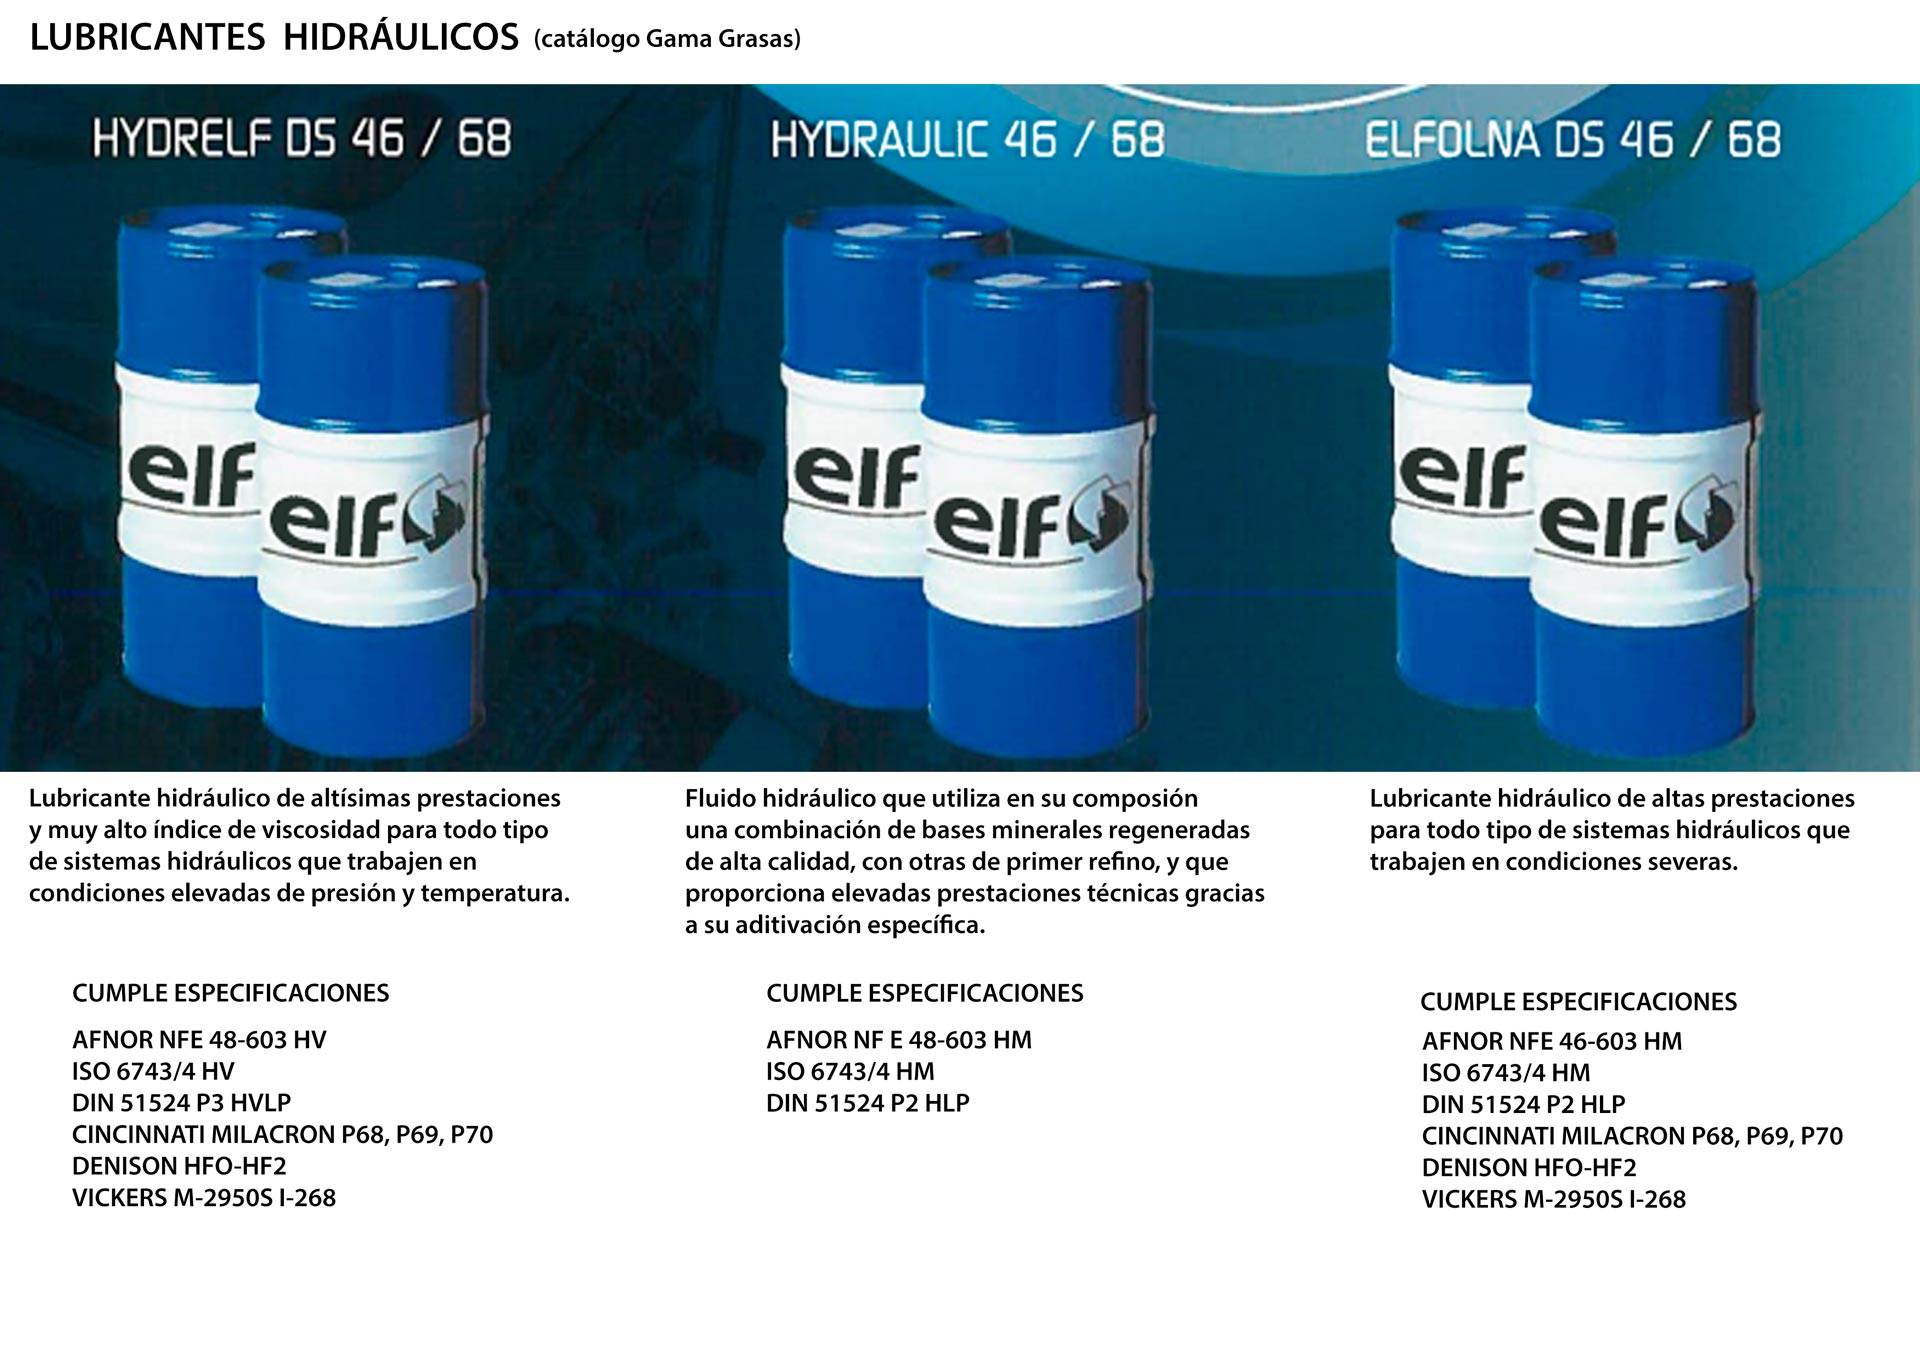 lubricantes-hidraulicos-elf.1920jpg